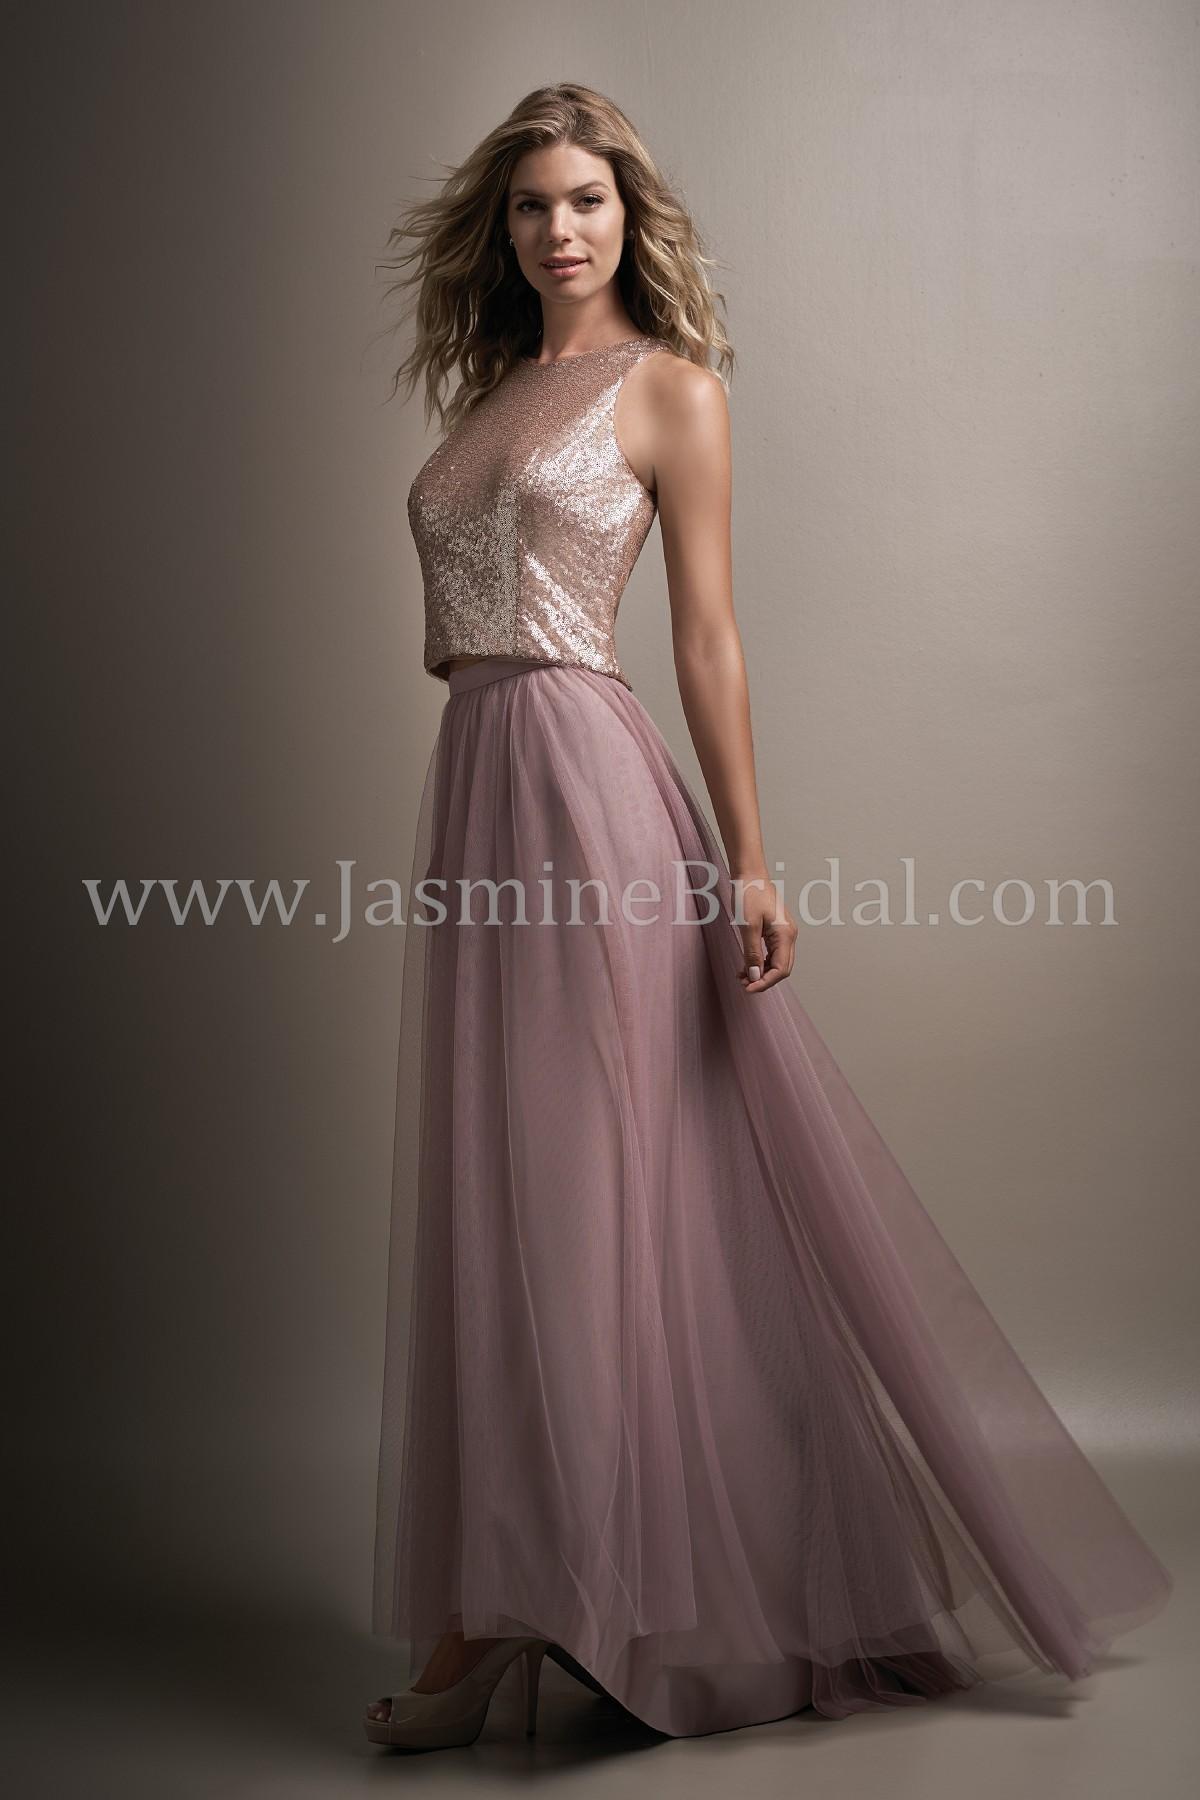 fb3f00bc456 Bridesmaid Dress Designers Archives - Chryssie s Bridal